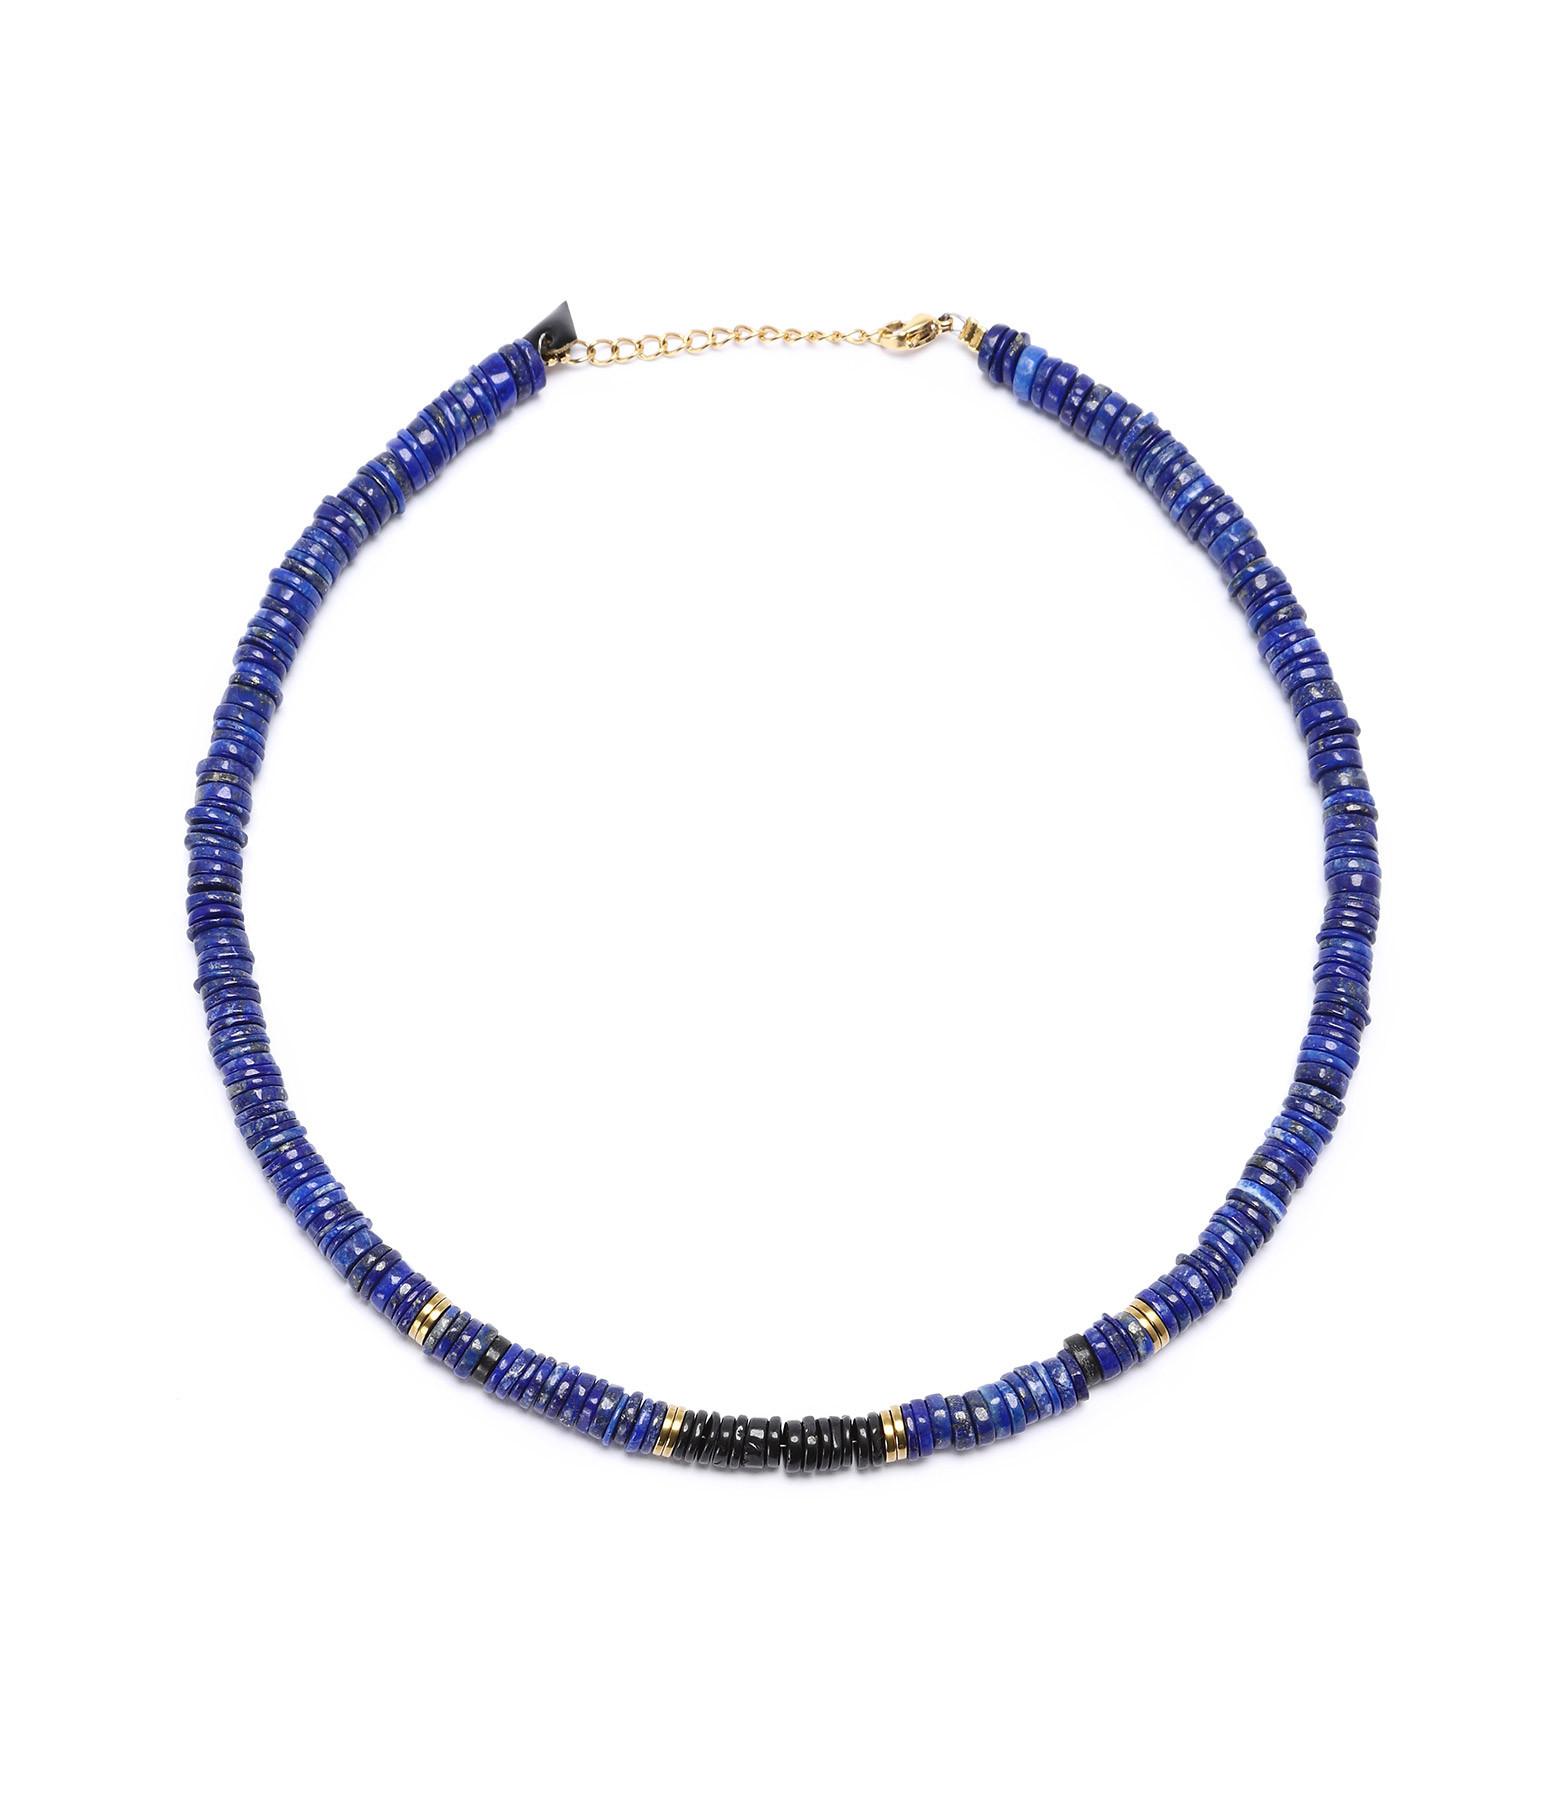 MON PRECIEUX GEM - Collier Puka Onyx Lapis-Lazuli